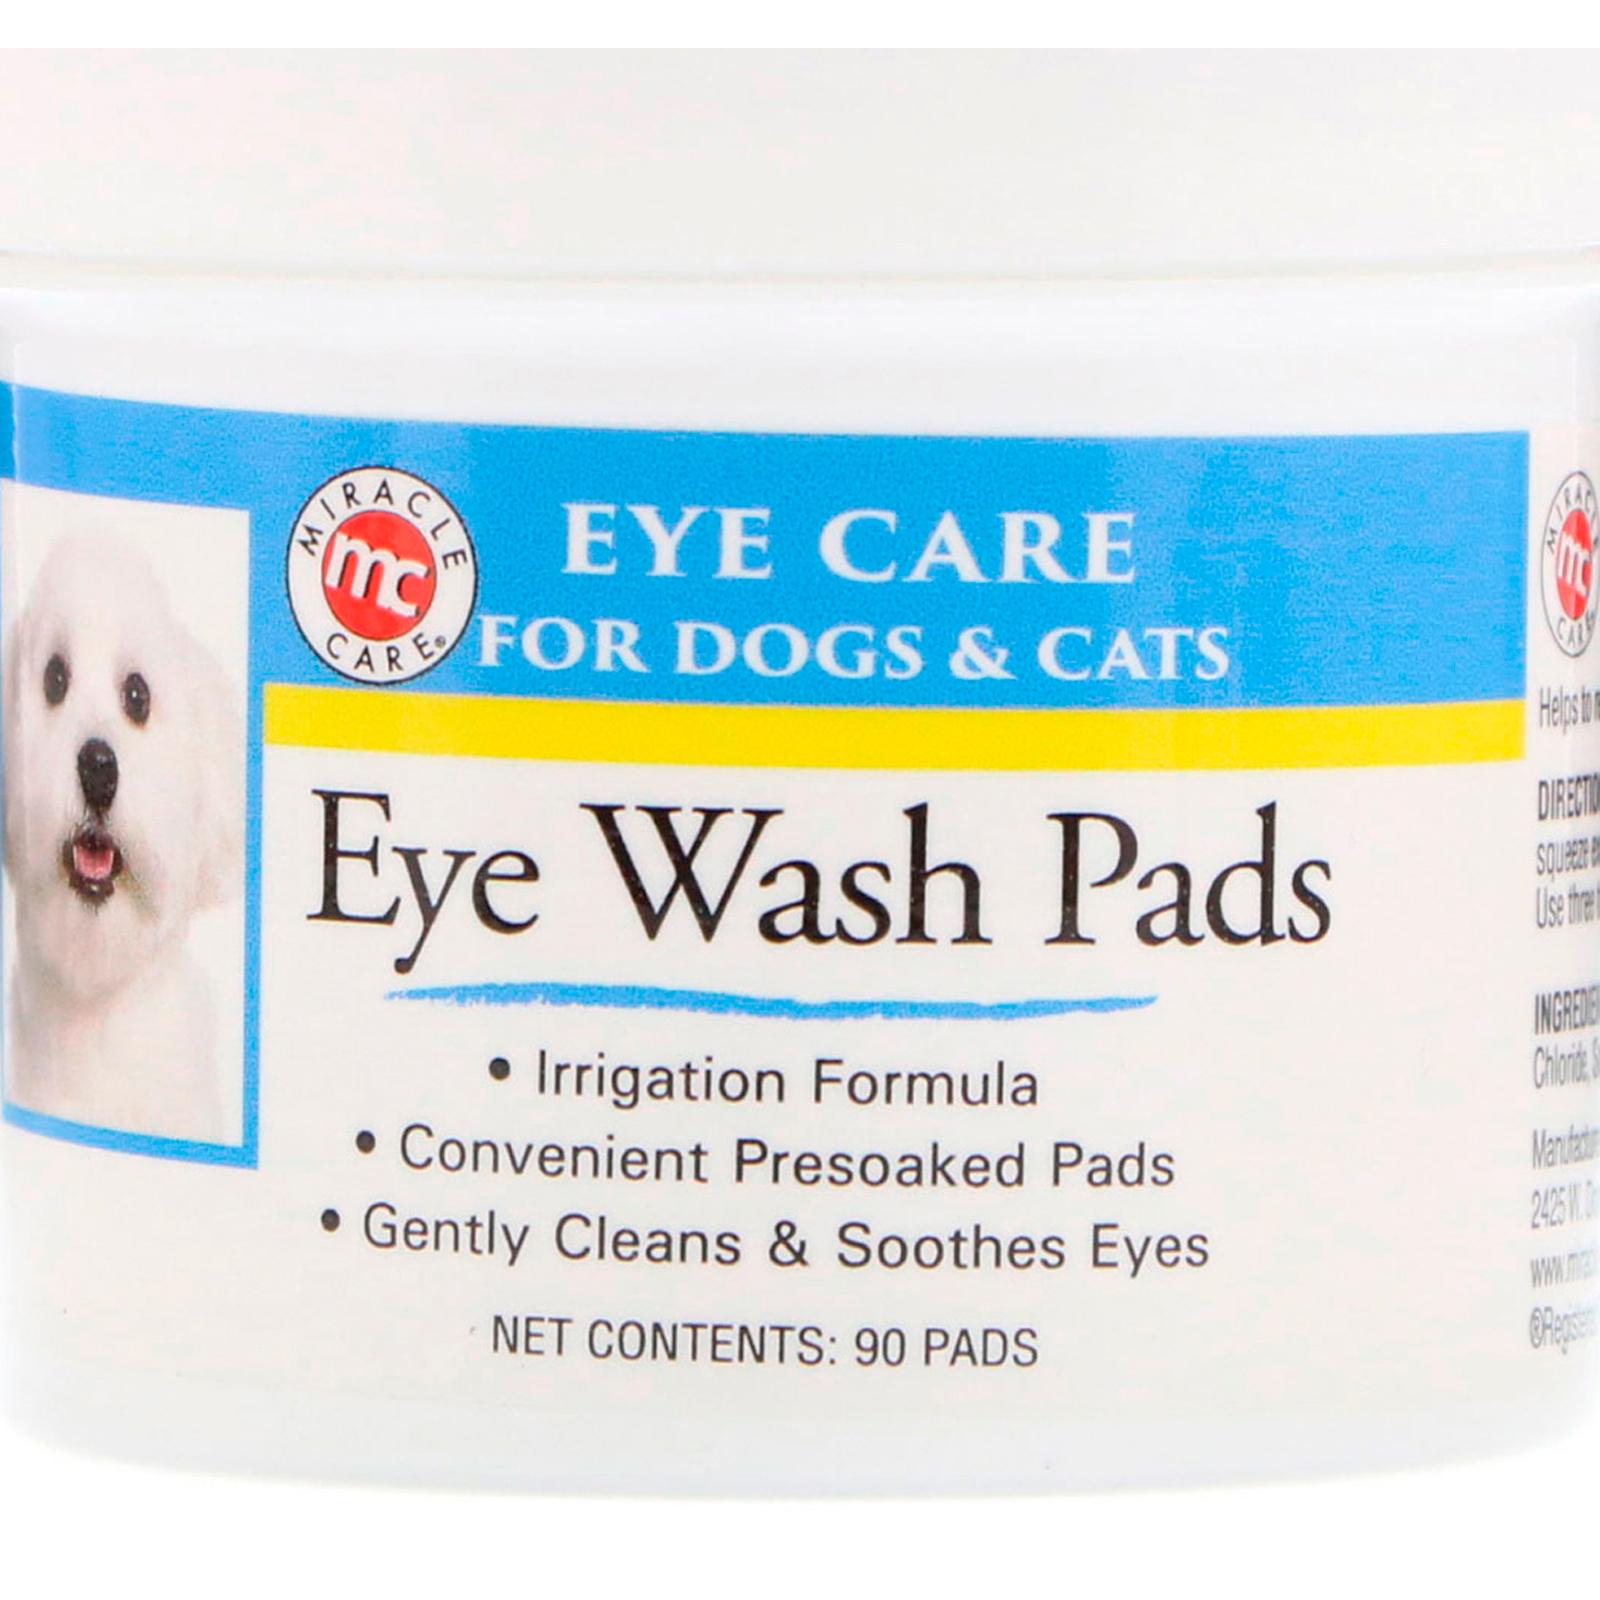 Miracle Care, 眼部護理, 眼部清洗 棉墊, 貓狗 專用,90片